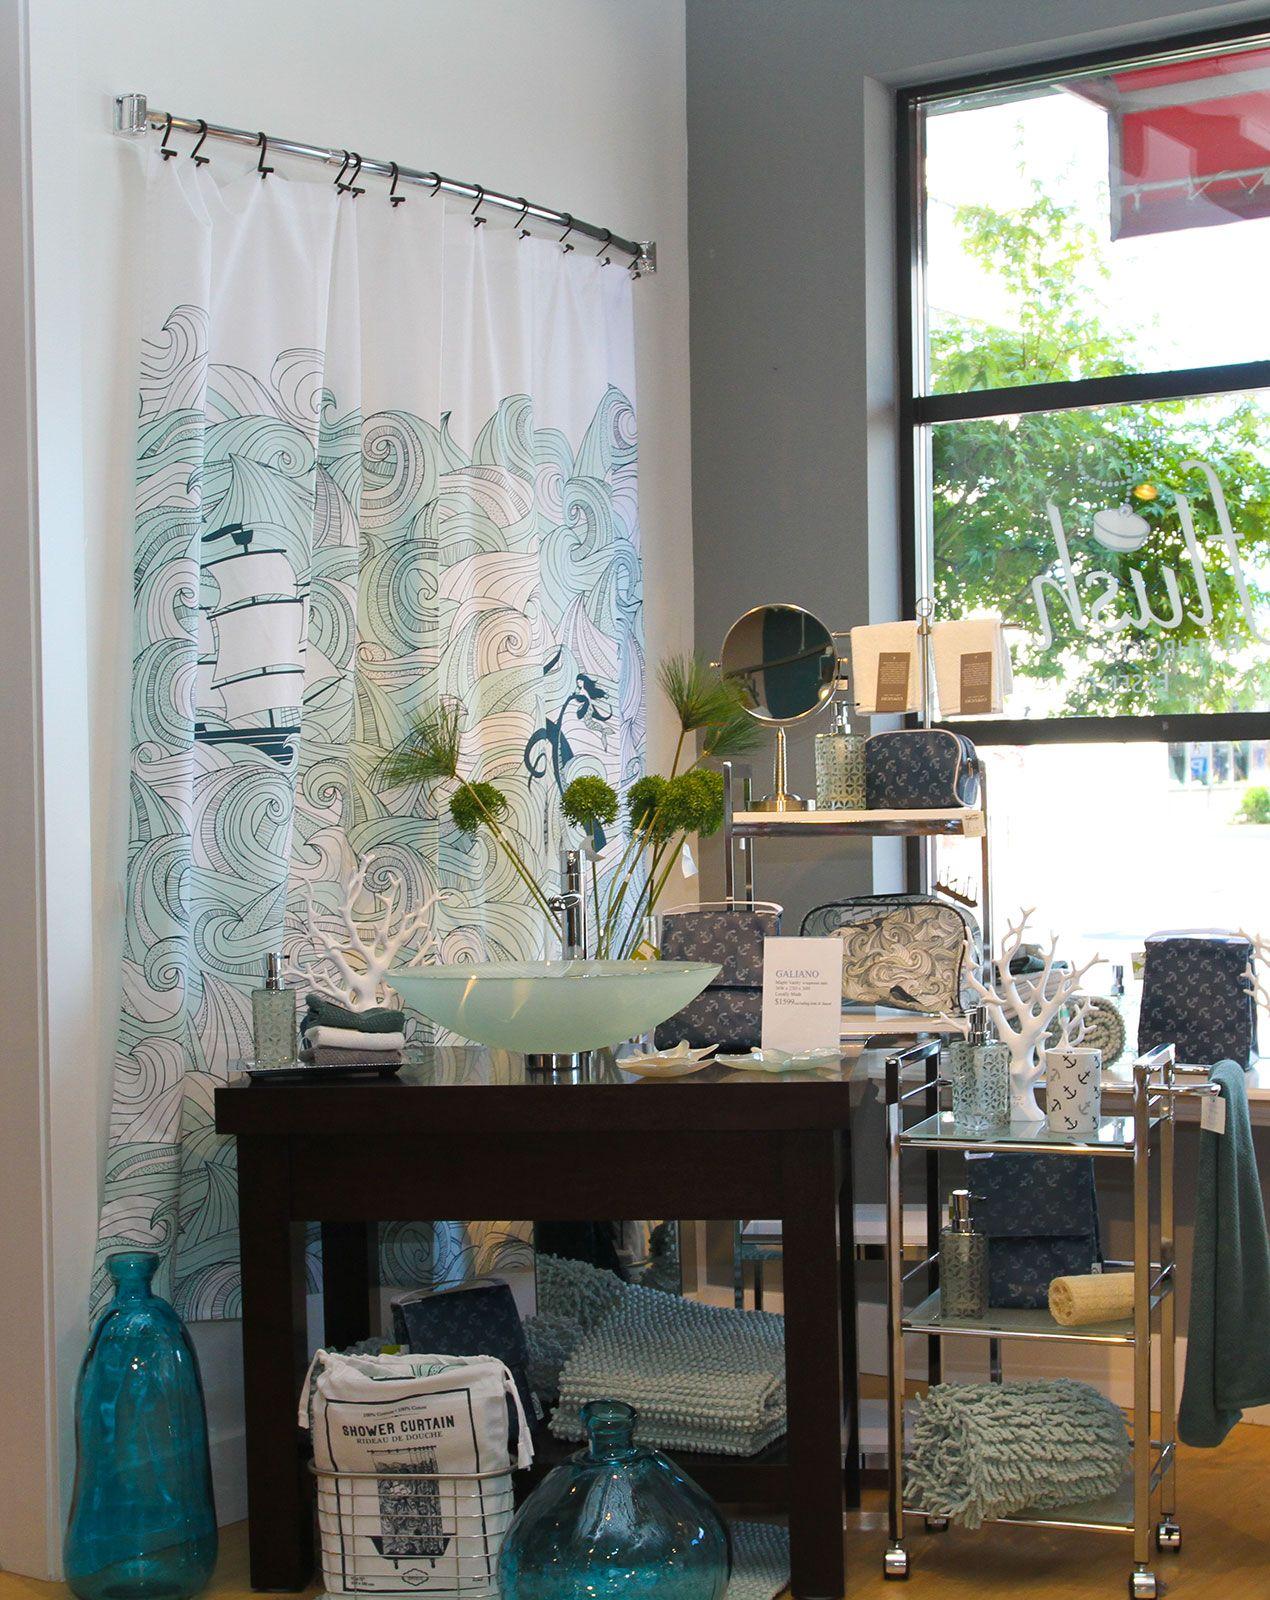 Bathroom colors themes decor ideas on pinterest shower - And Again Sea Scape Shower Curtain Ocean Themes